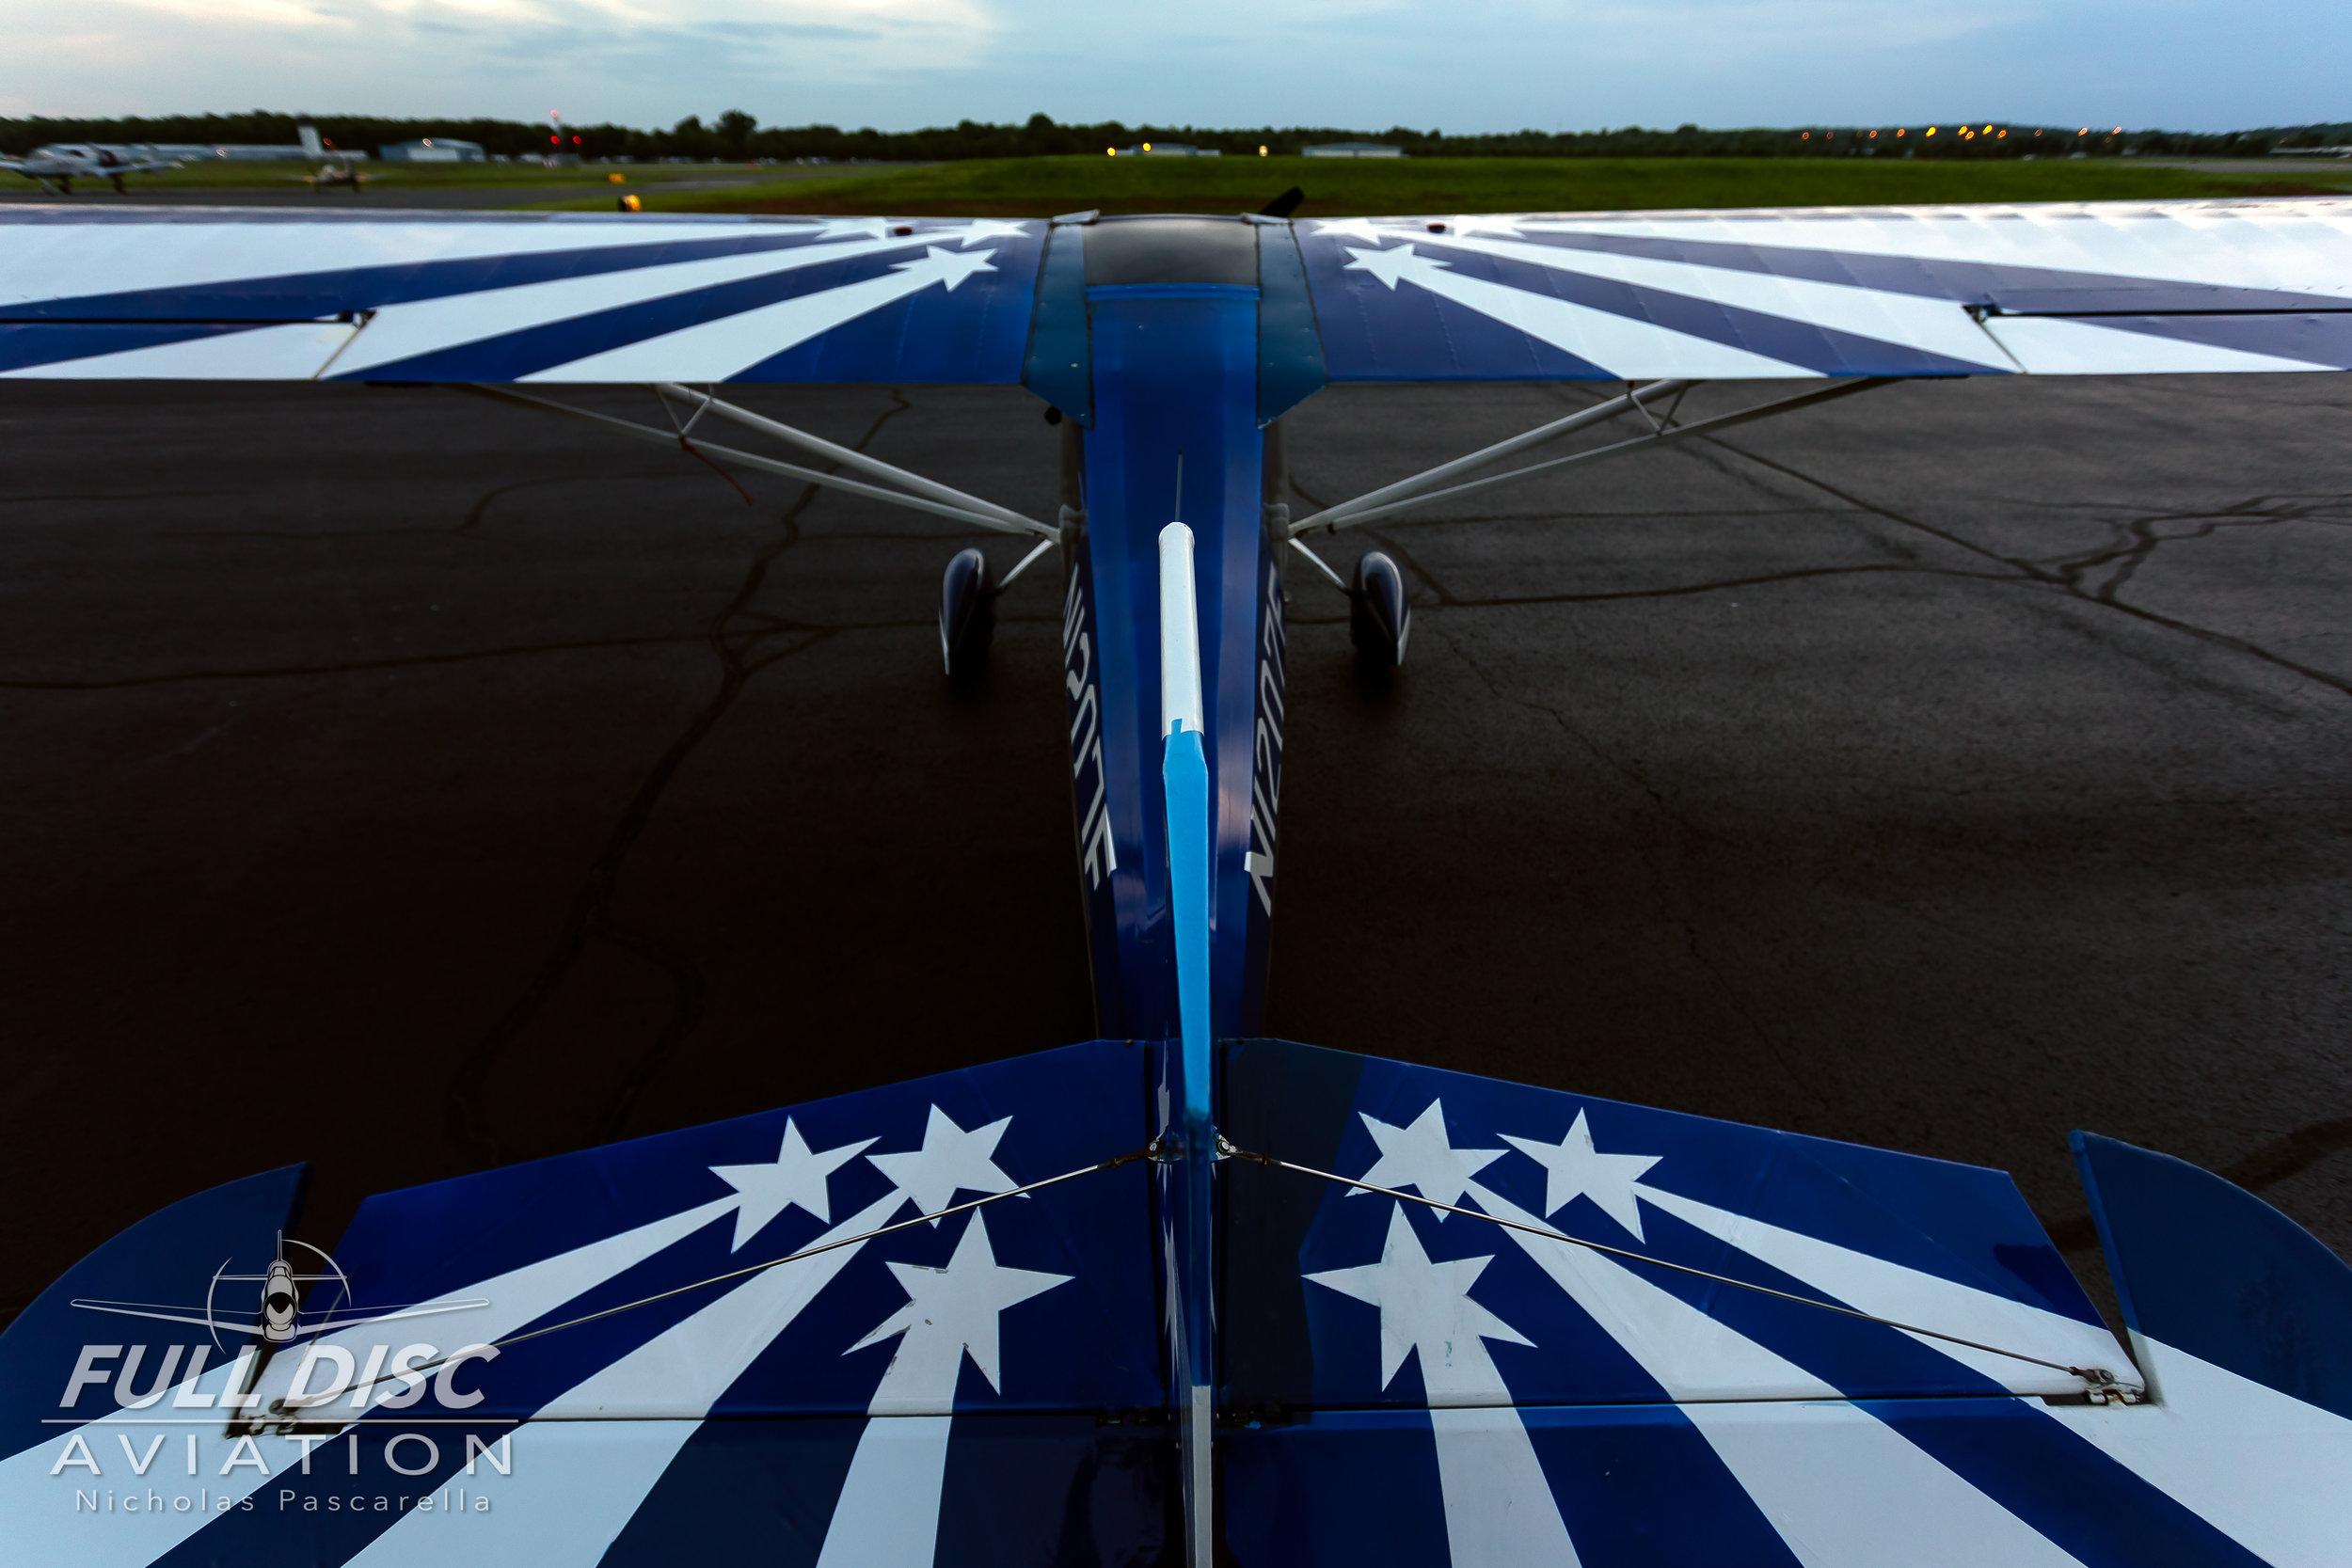 rjgritter_topsiderear_nickpascarella_nicholaspascarella_fulldiscaviation_aviation_.jpg